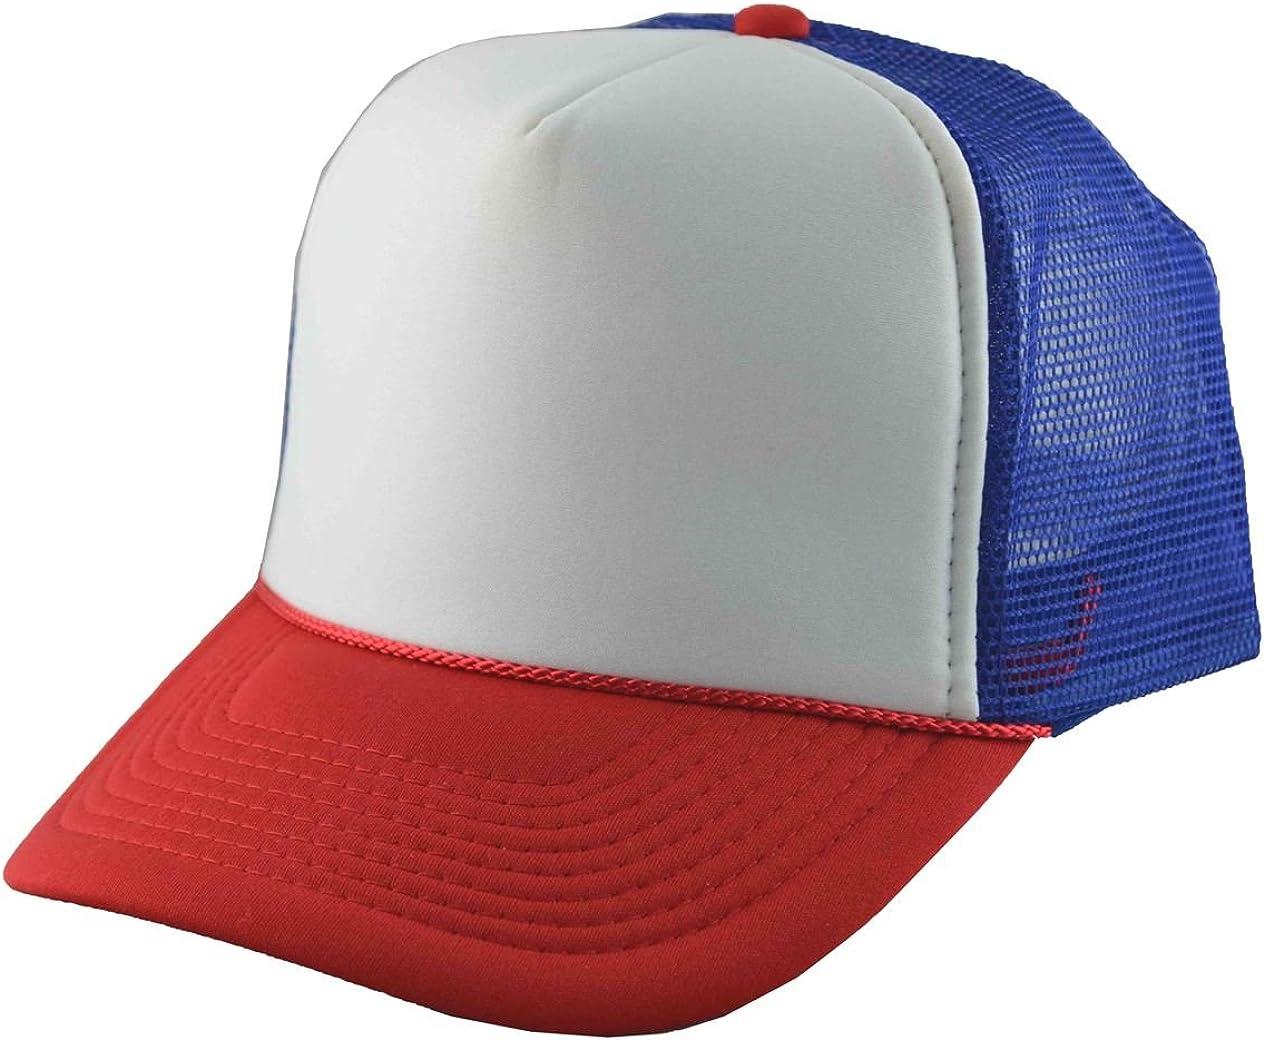 NIS Men's Mesh Trucker Adjustable Cap 3 Tone Royal Blue Red White